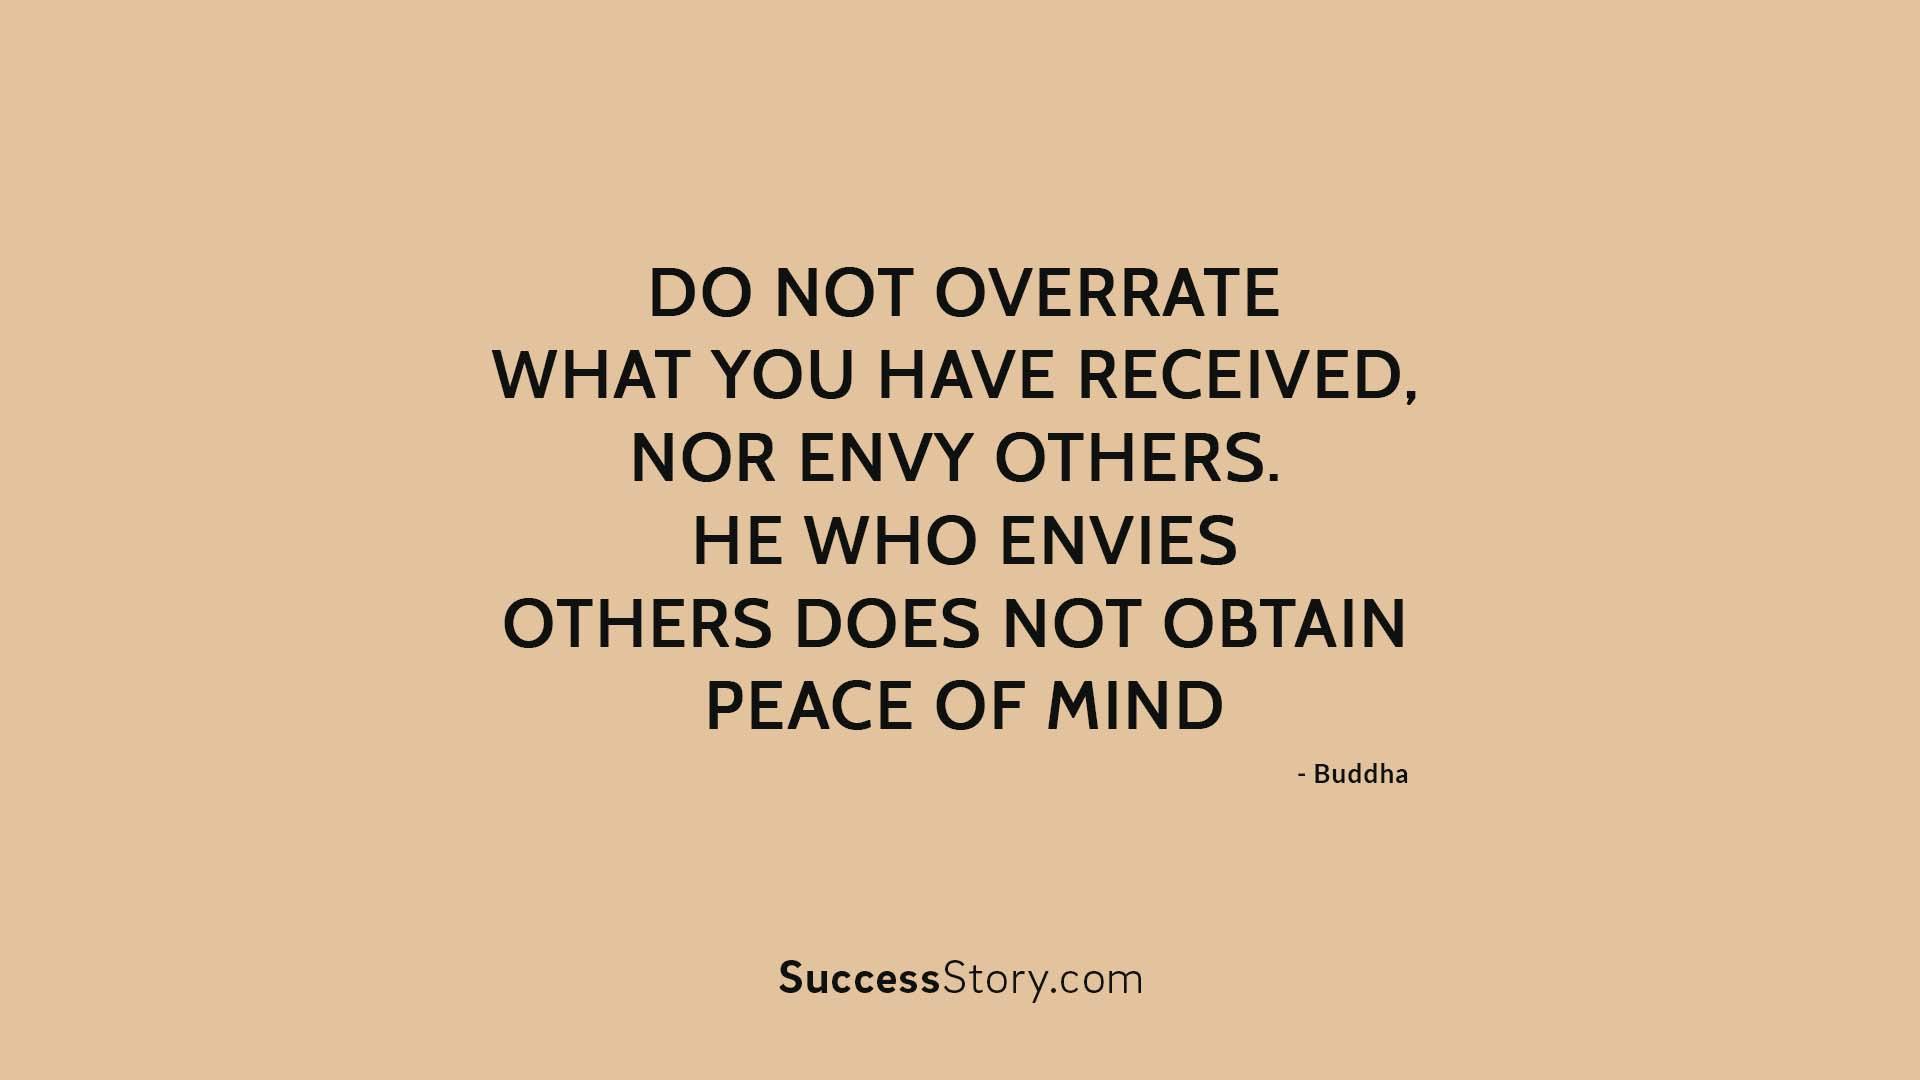 Do not overrate